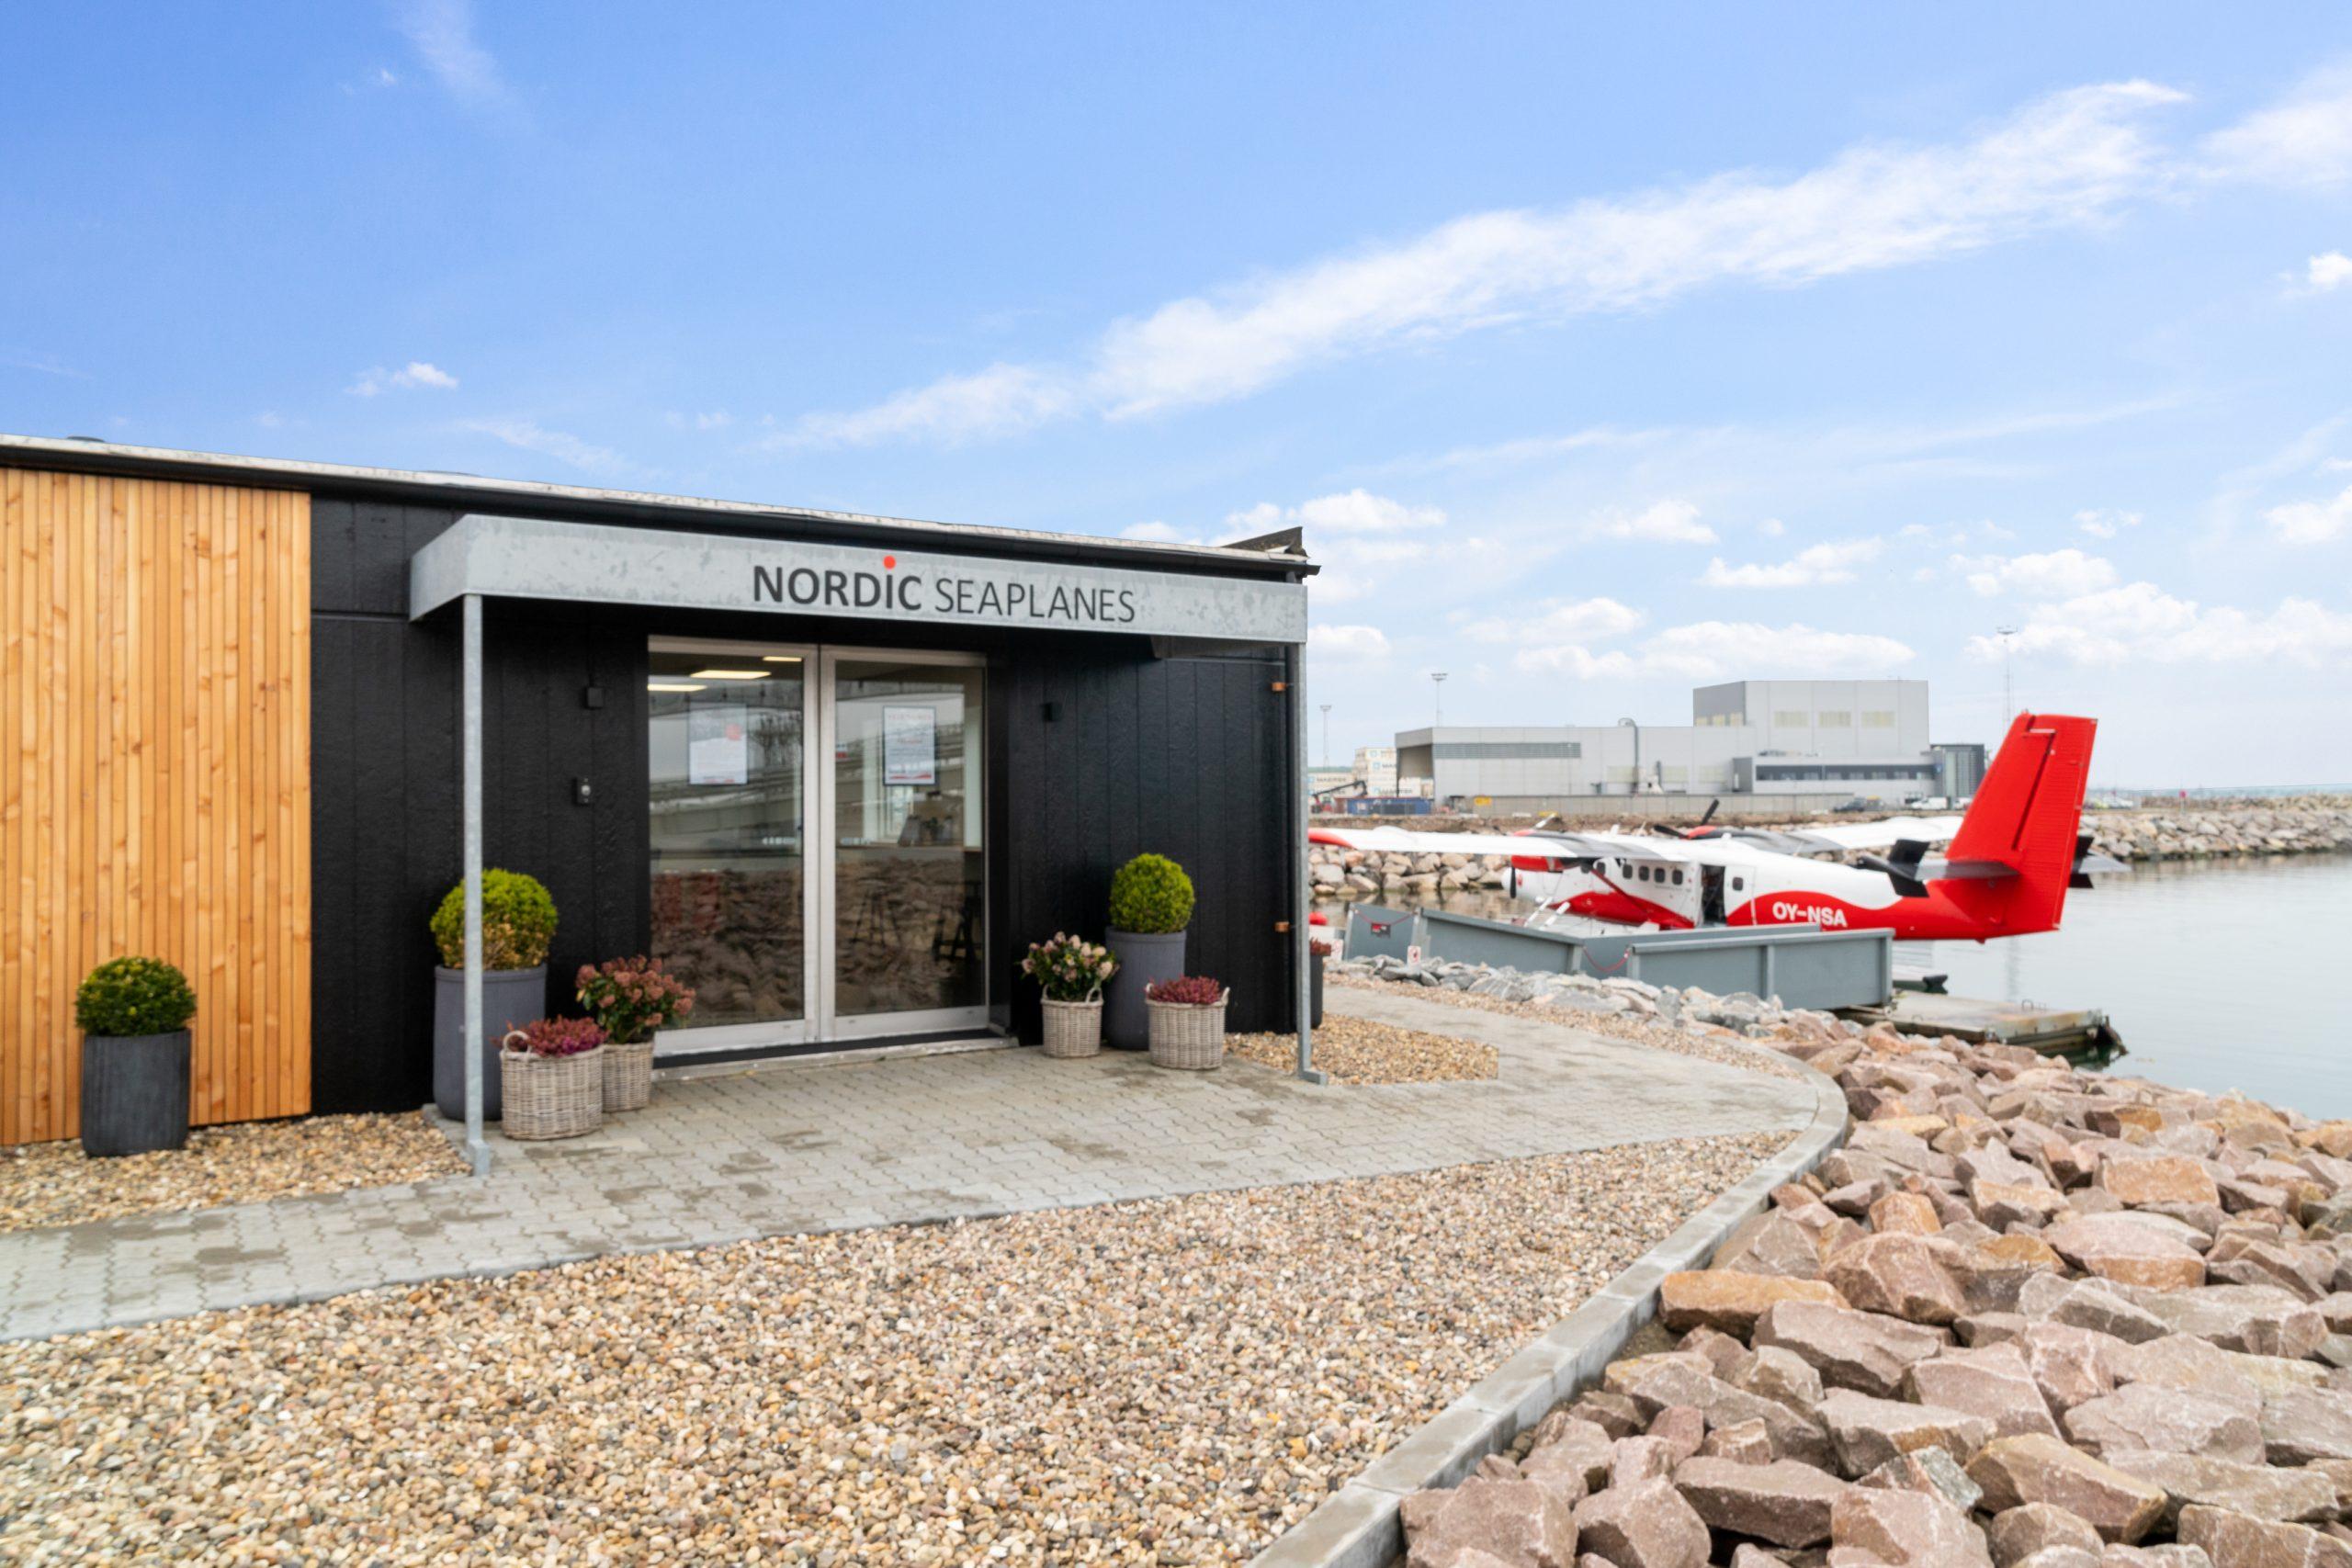 Nordic Seaplanes-terminalen i Aarhus Havn. (Foto: Nordic Seaplanes   PR)